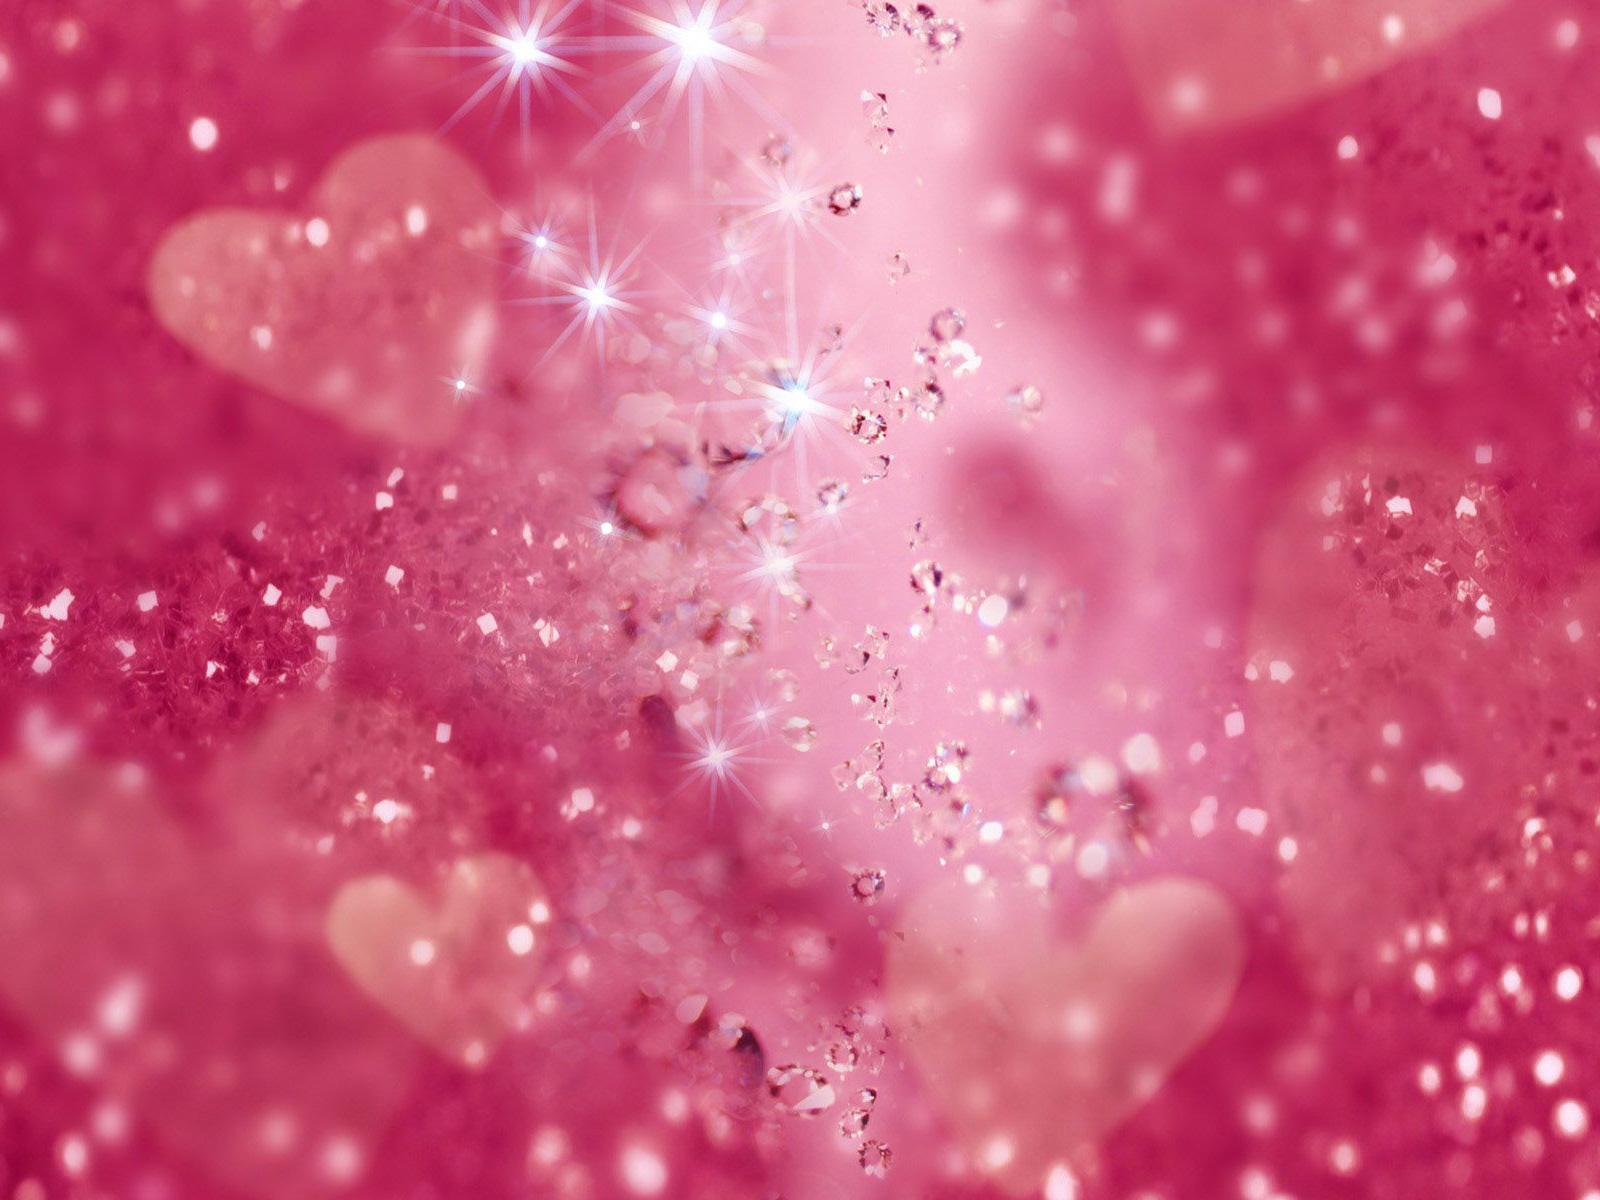 Pink wallpaper desktop Funny amp Amazing Images 1600x1200